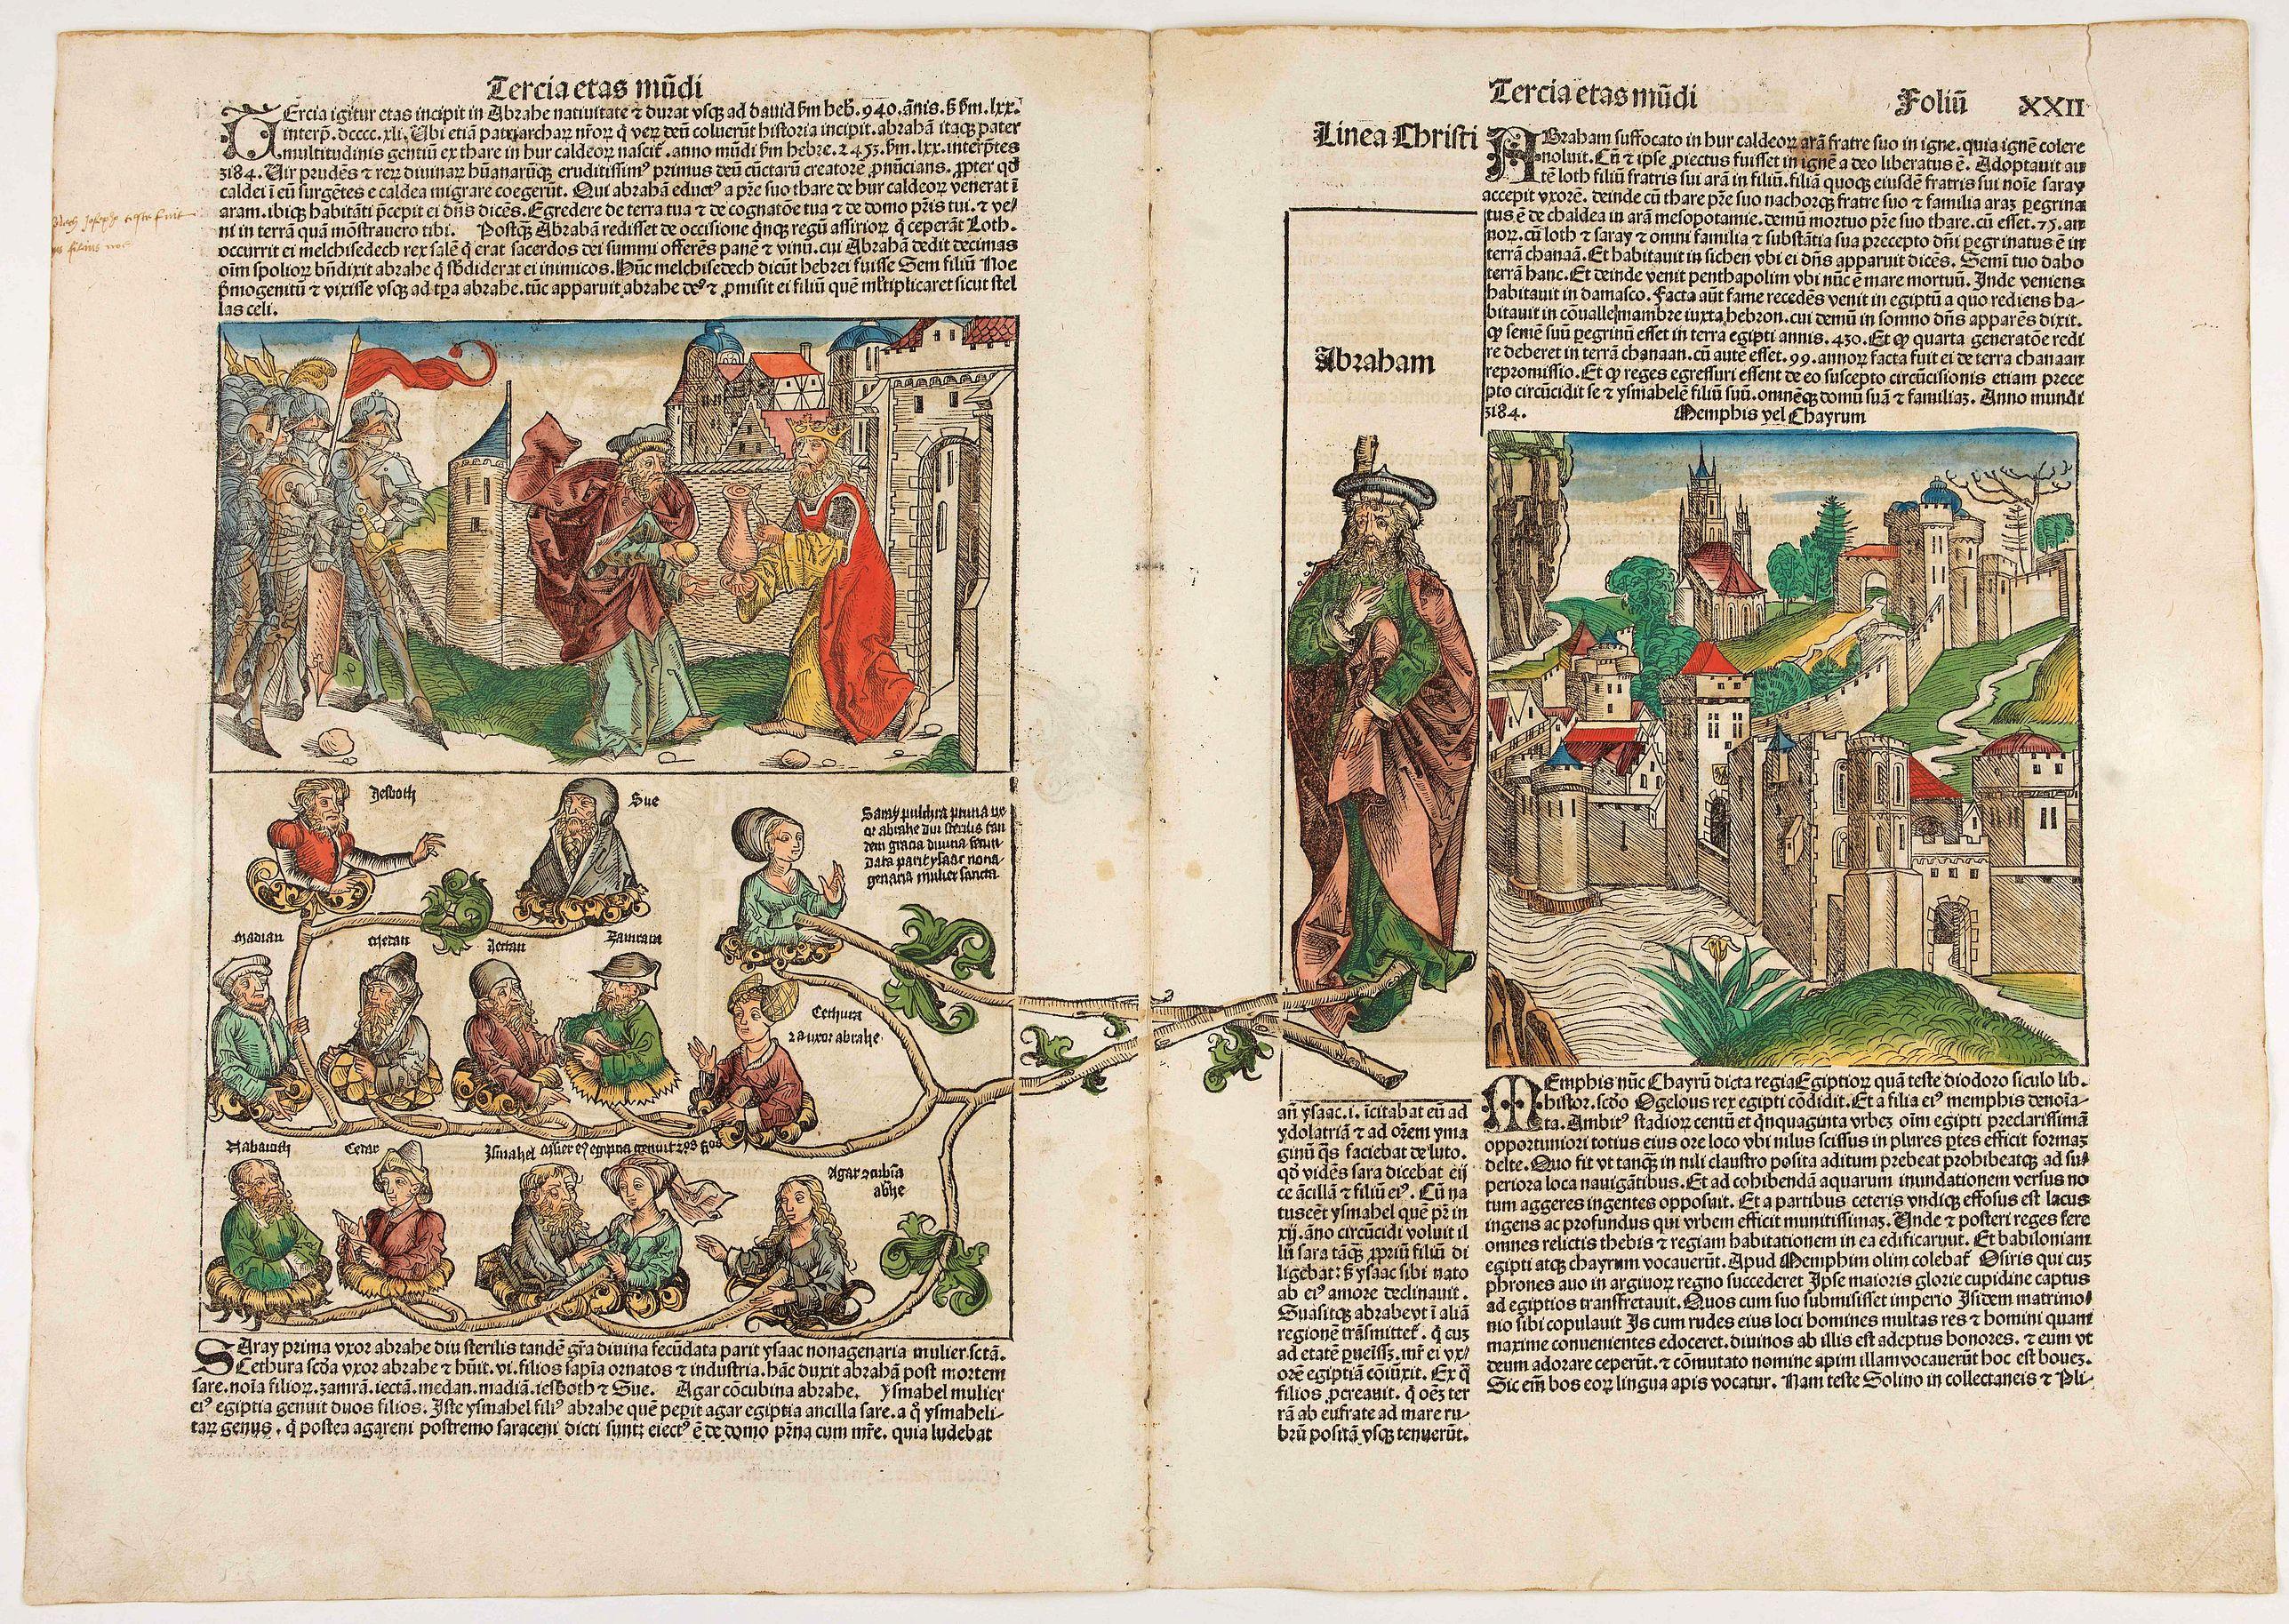 SCHEDEL, H. -  Secunda Etas Mundi. Foliu XXI (and) XXII [With genealogies of the Third Age of the World begining with Abraham]